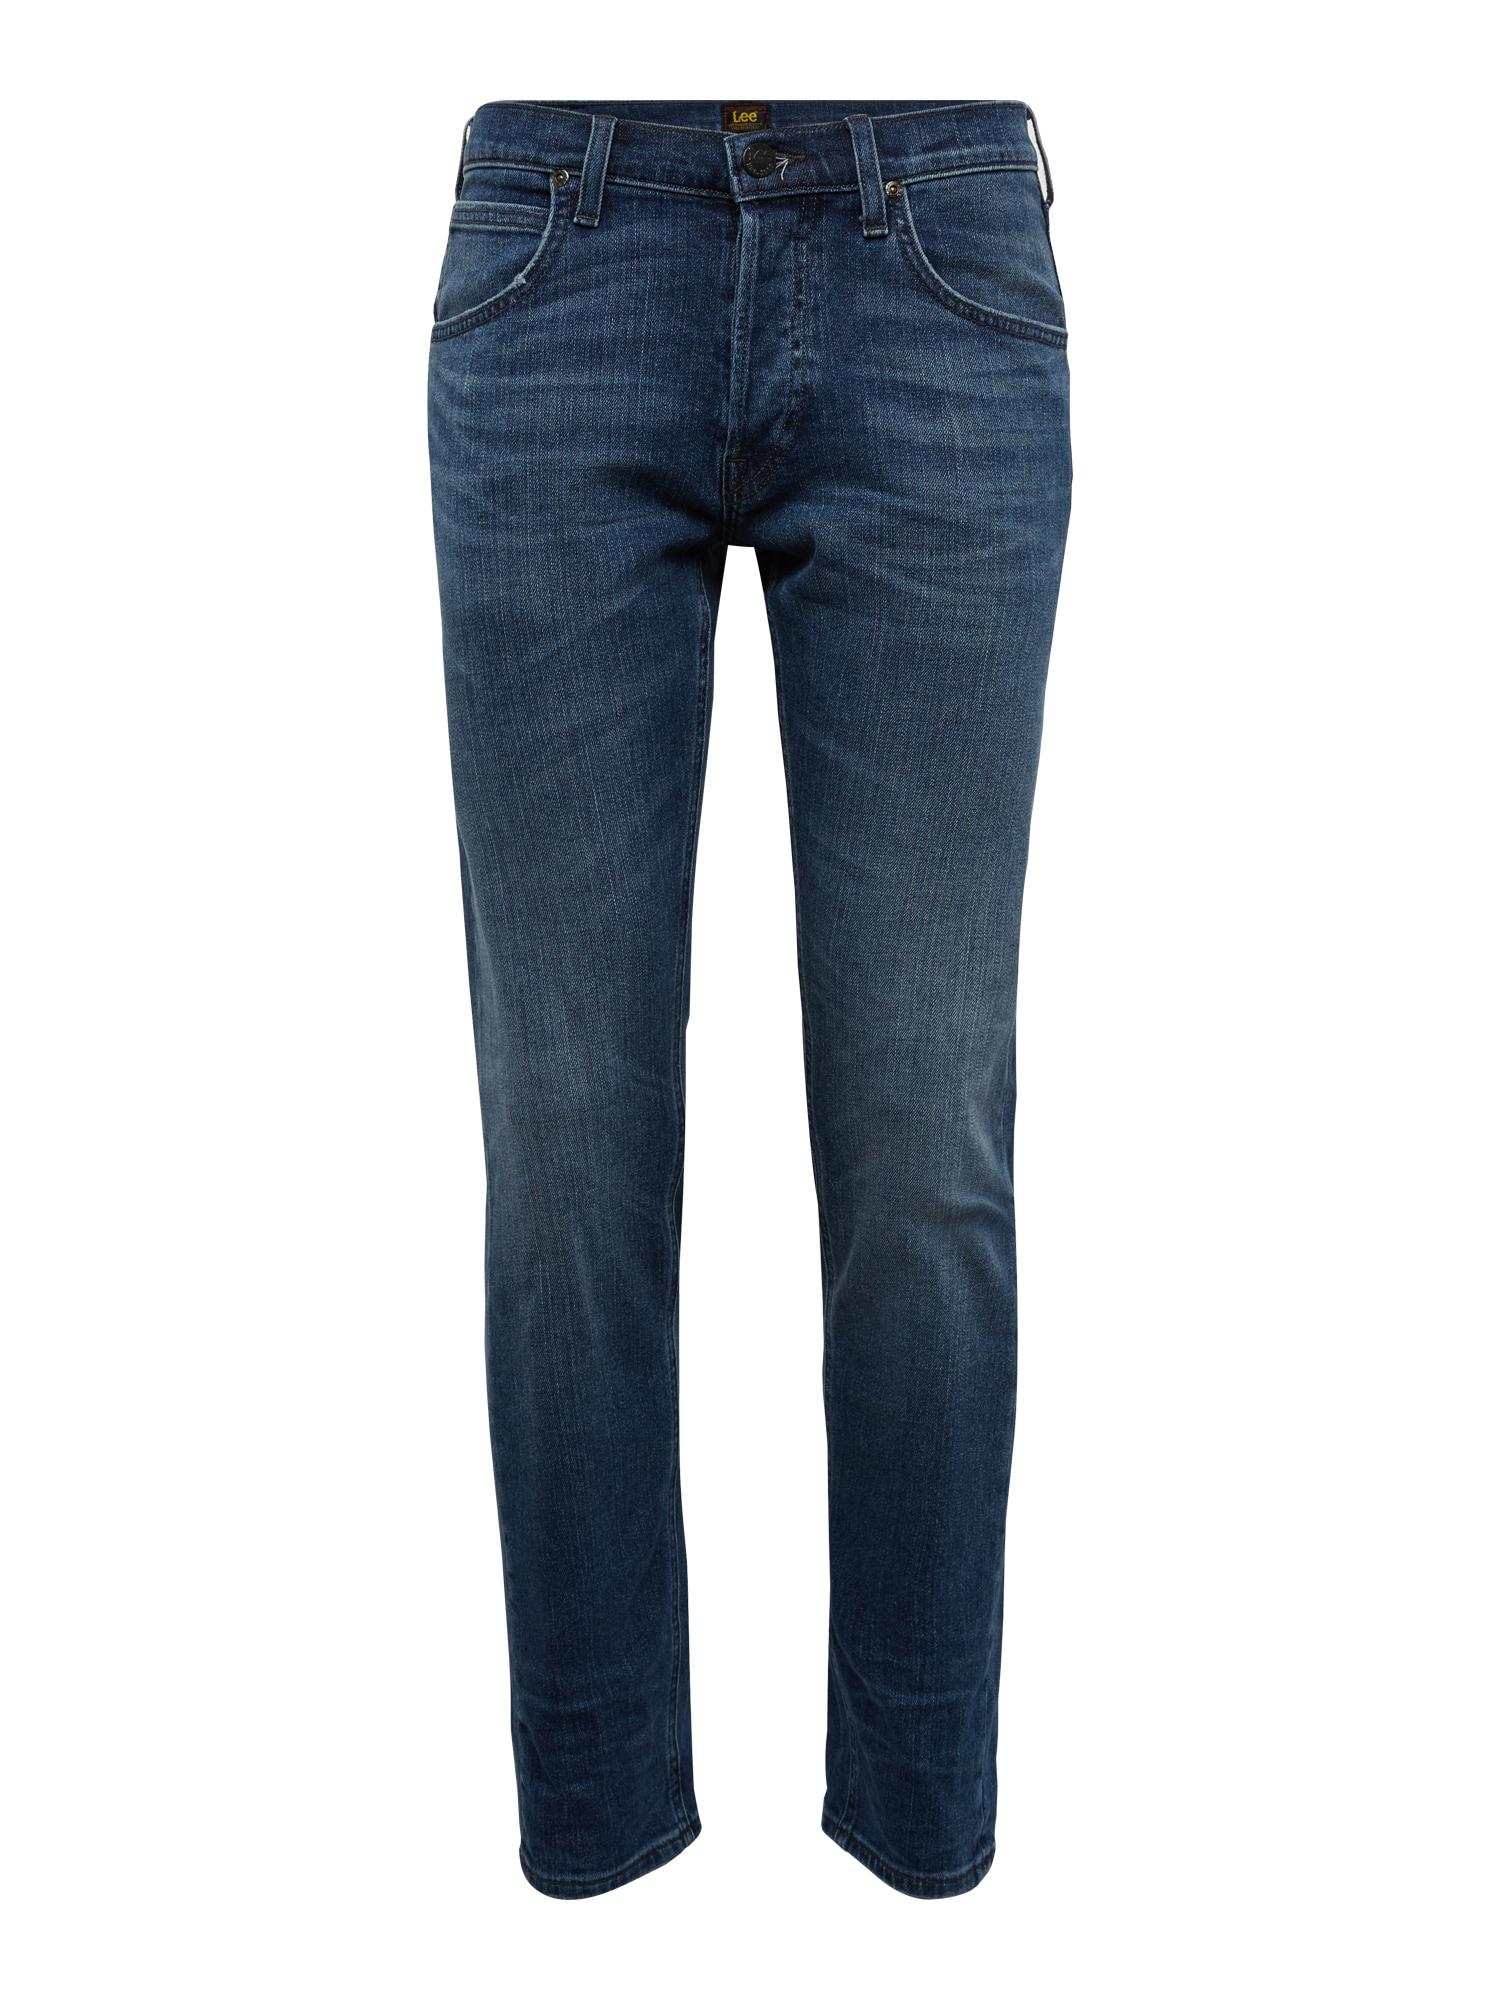 Straight Leg Jeans 'Daren'   Bekleidung > Jeans > Straight Leg Jeans   Lee